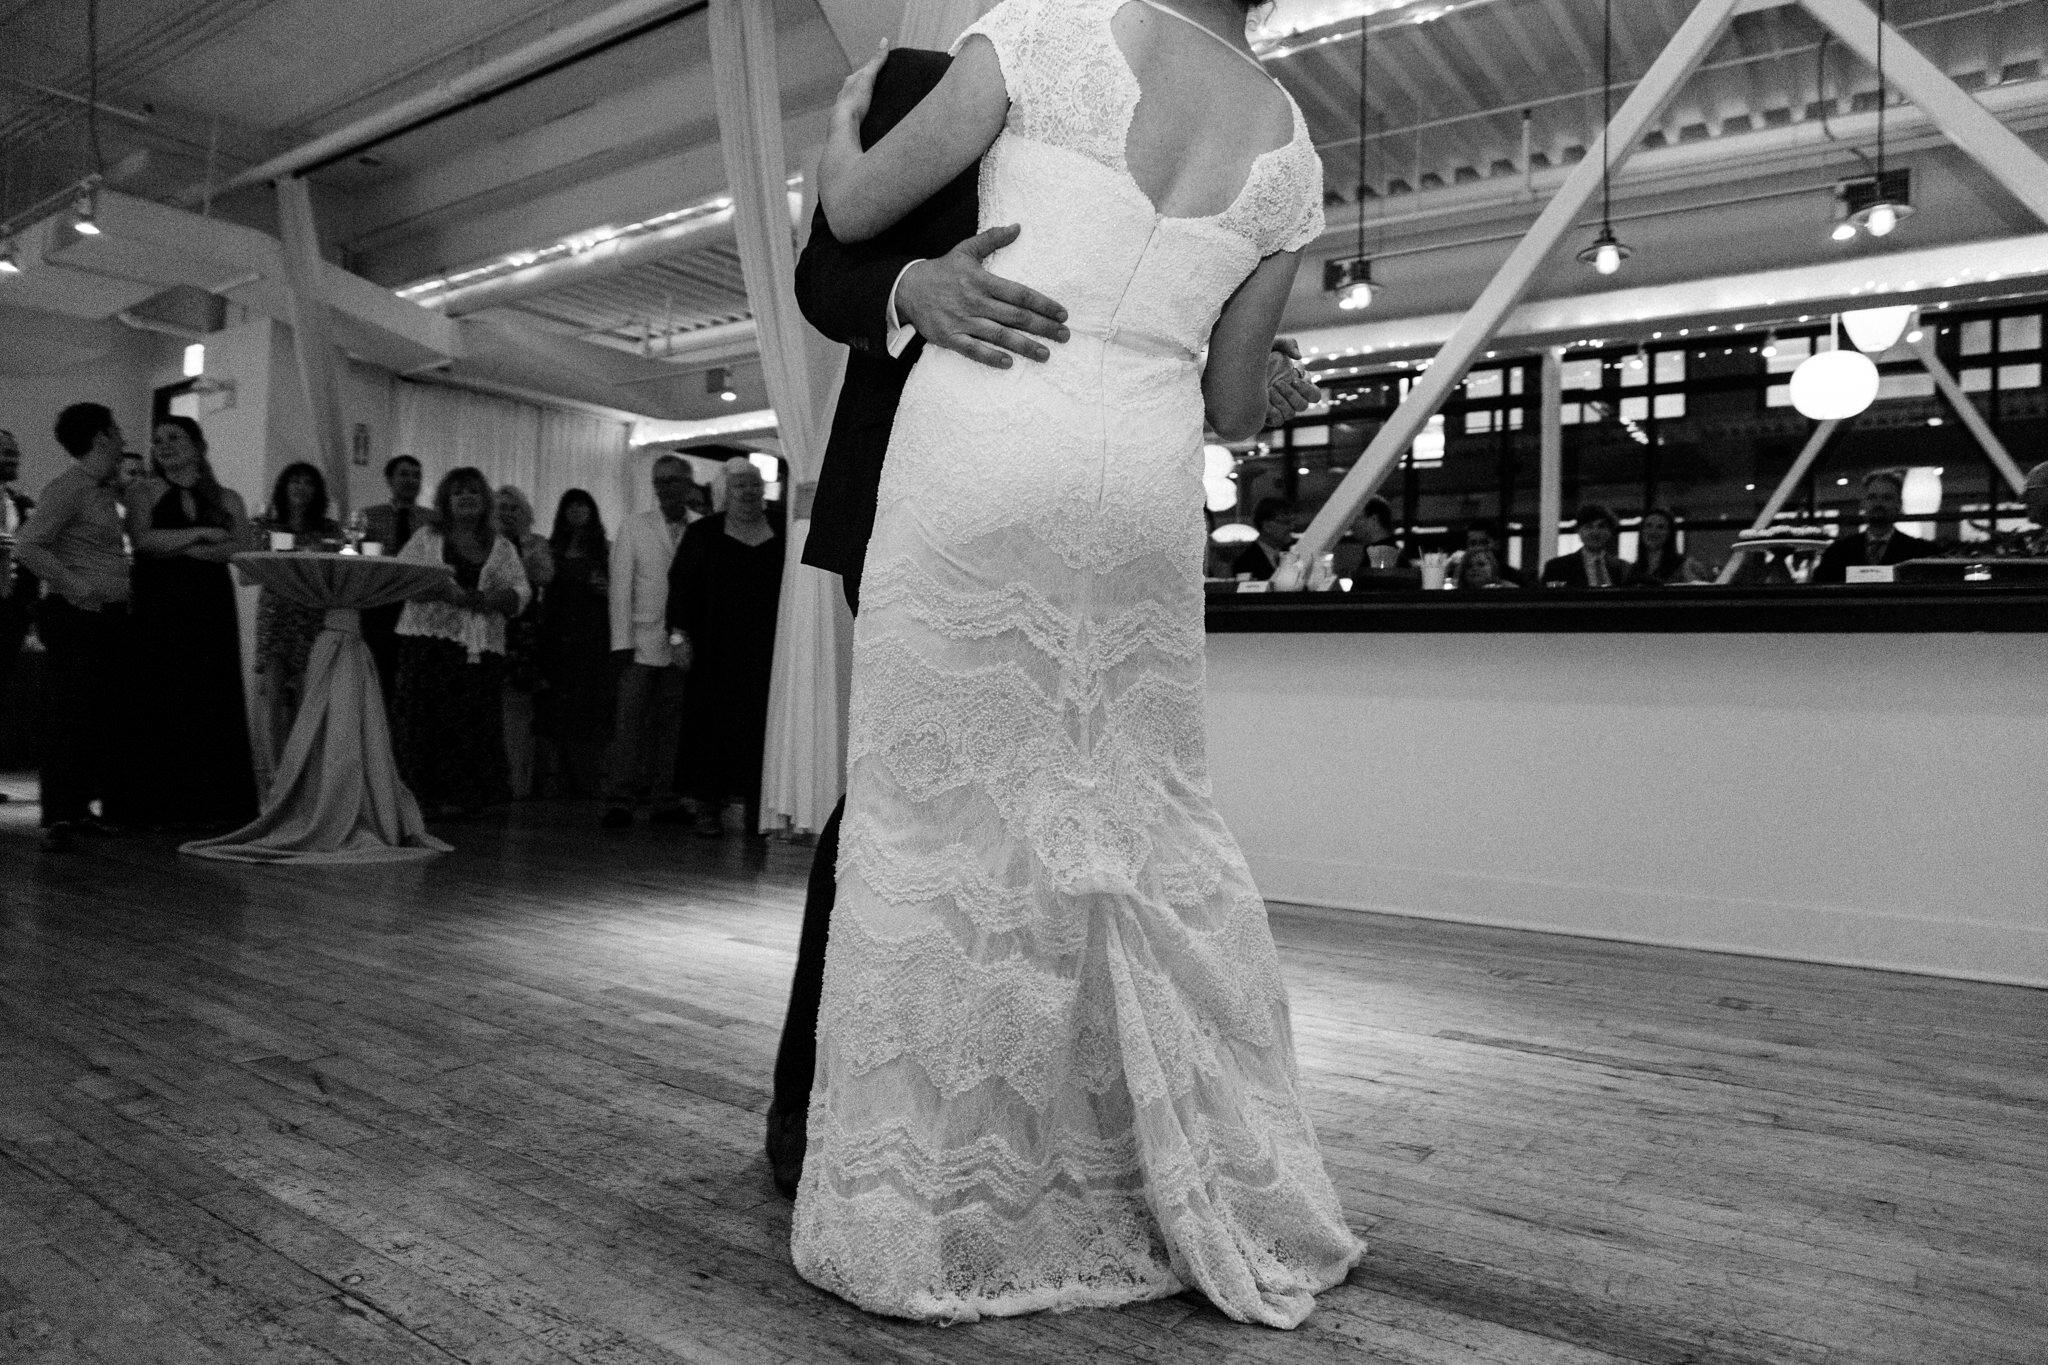 chicago-greenhouse-loft-wedding-dance-rebeccaylasotras-5.jpg